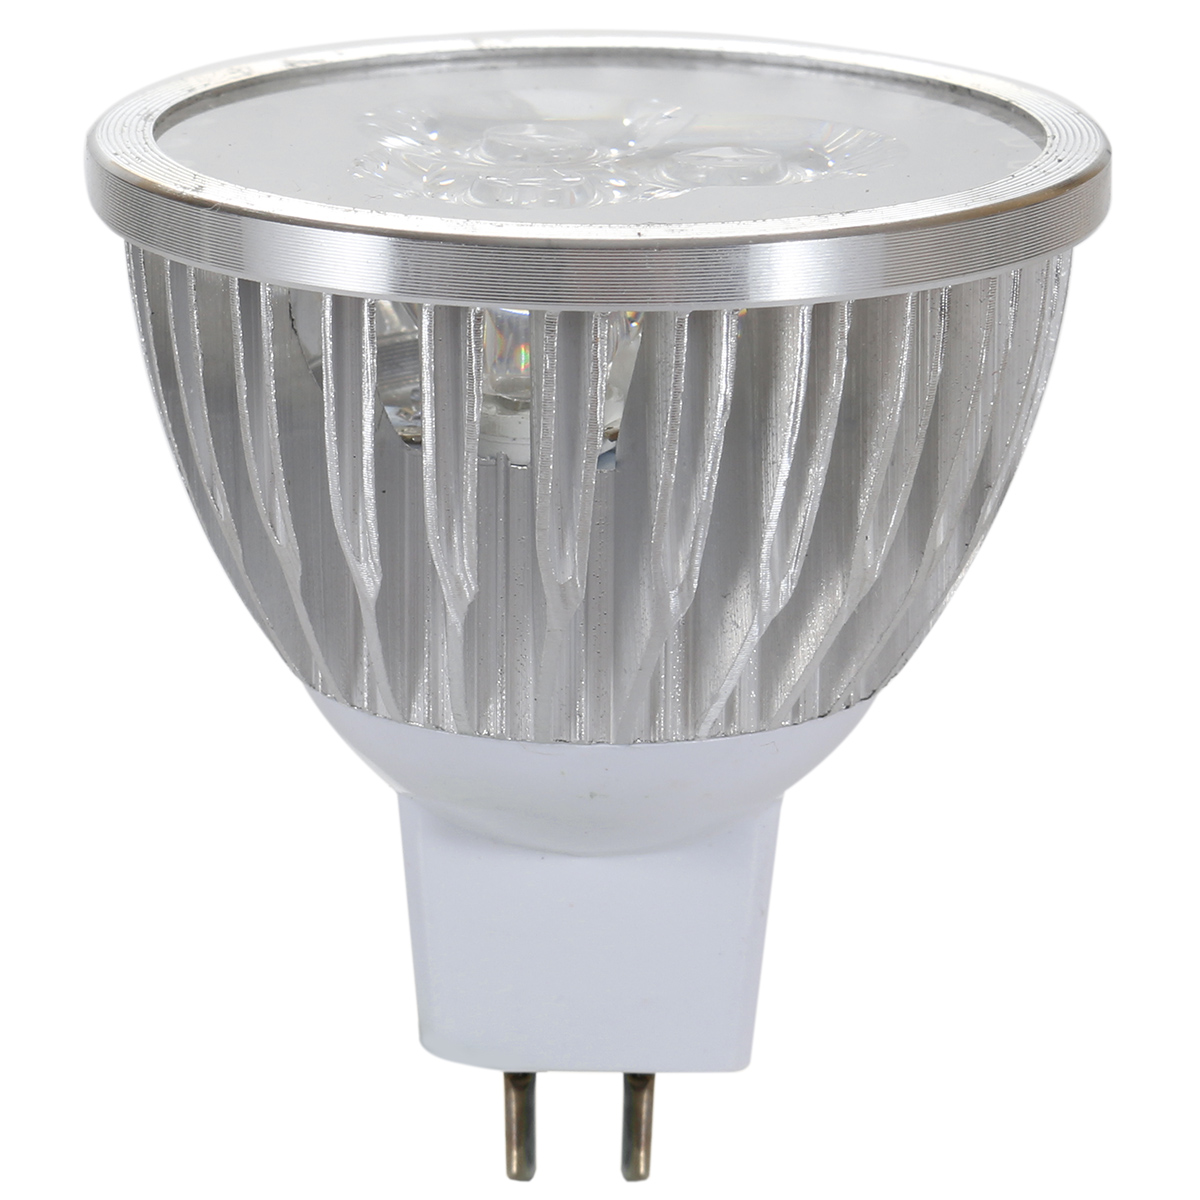 gu10 mr16 e14 e27 3w led energy saving bombilla spotlight lamp bulb 12v 220v ebay. Black Bedroom Furniture Sets. Home Design Ideas